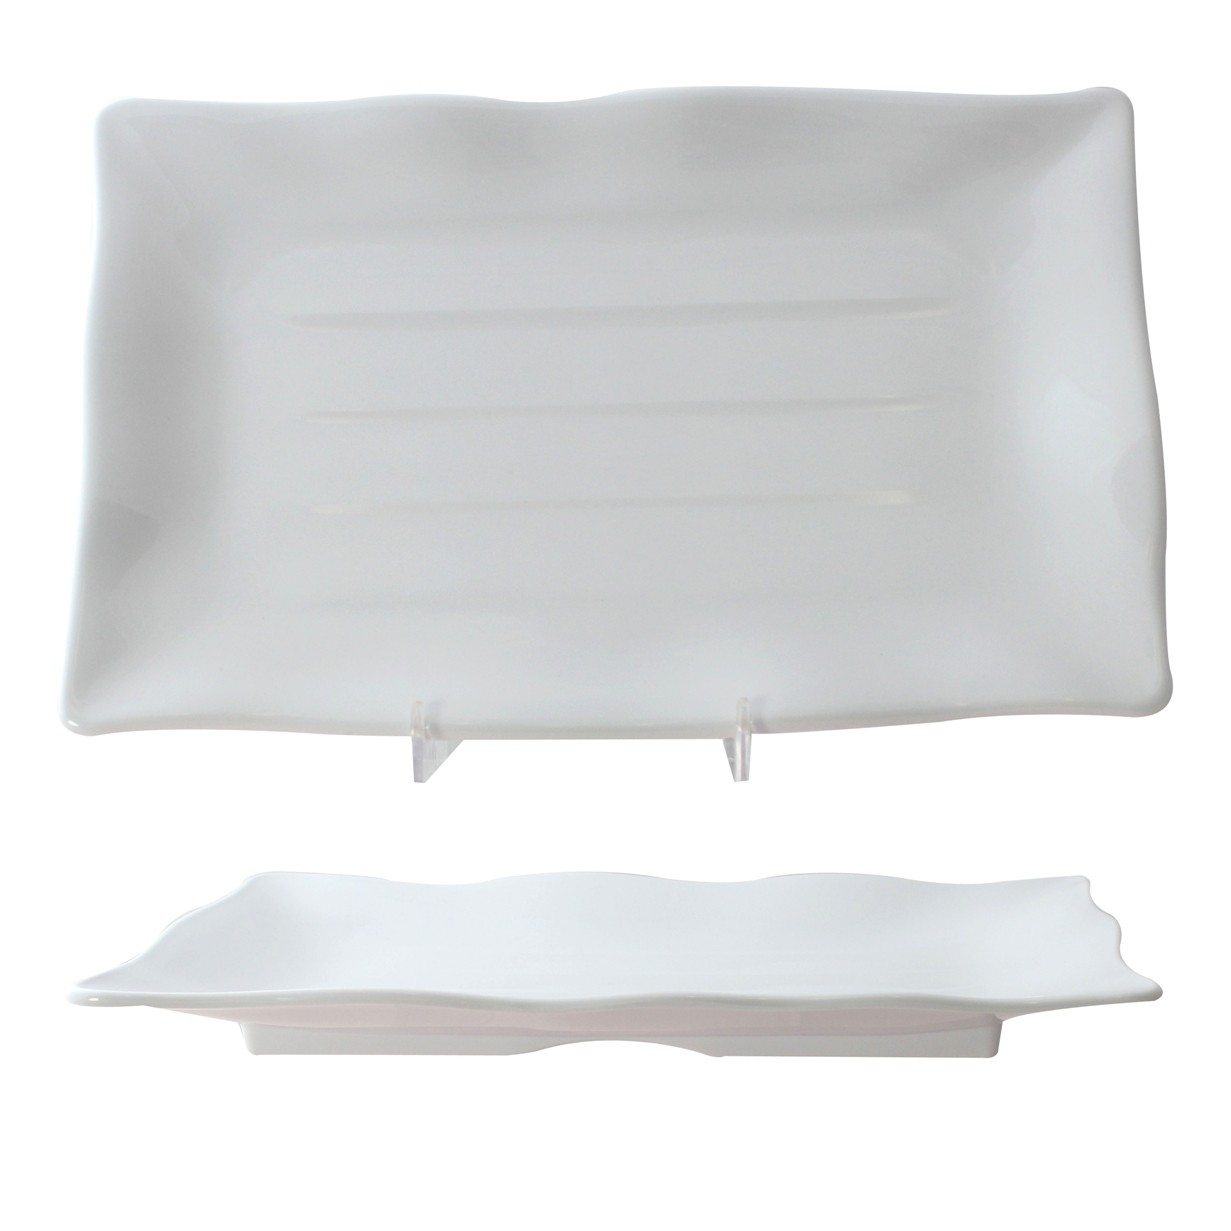 "Thunder Group 24140WT Classic White Rectangular Melamine Wave Plate 13-1/2"" x 9-1/8"""